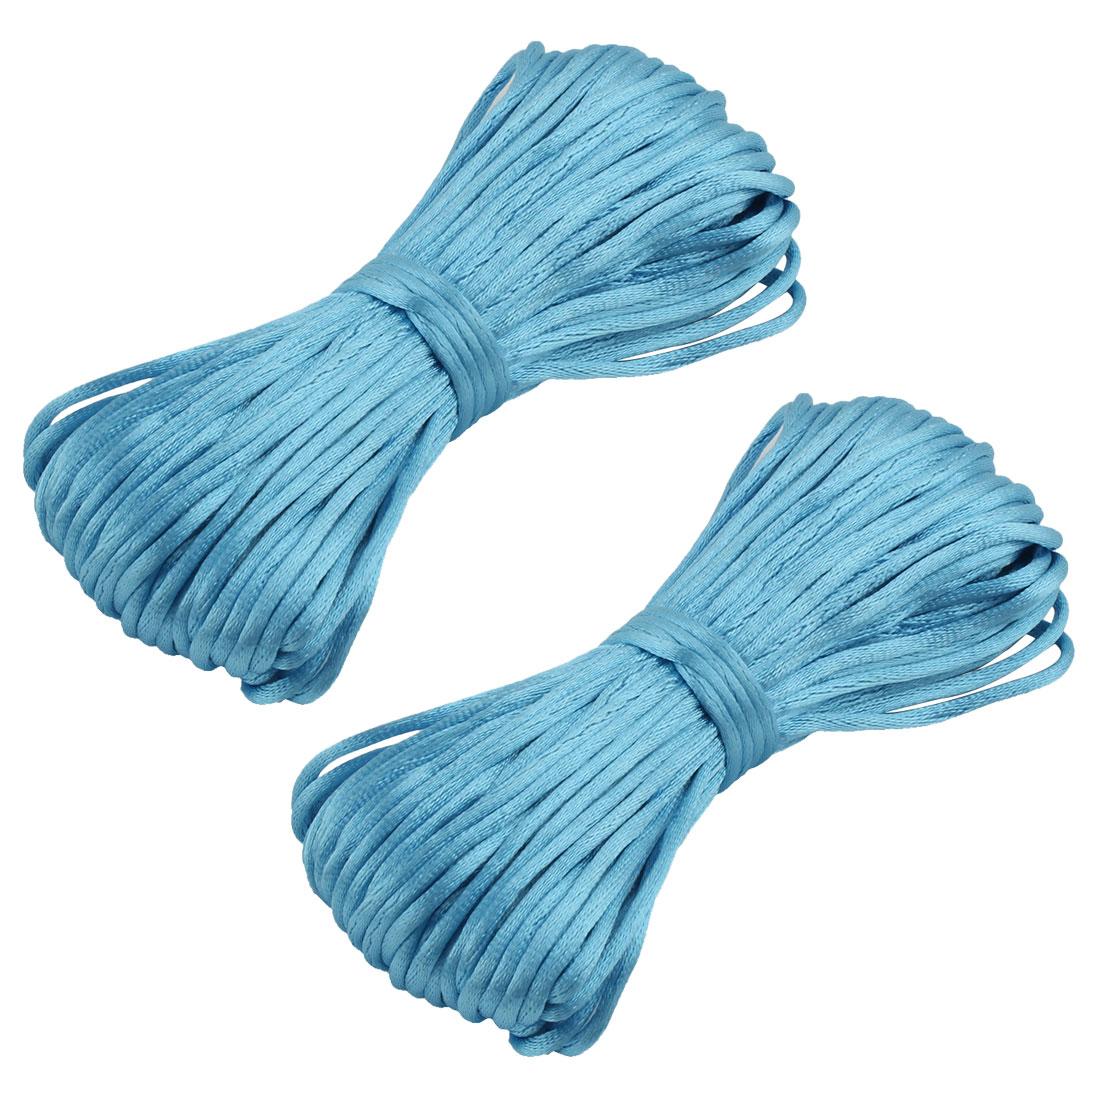 Nylon Handmade Craft DIY Chinese Knot Cord Rope Light Blue 22 Yards 2pcs